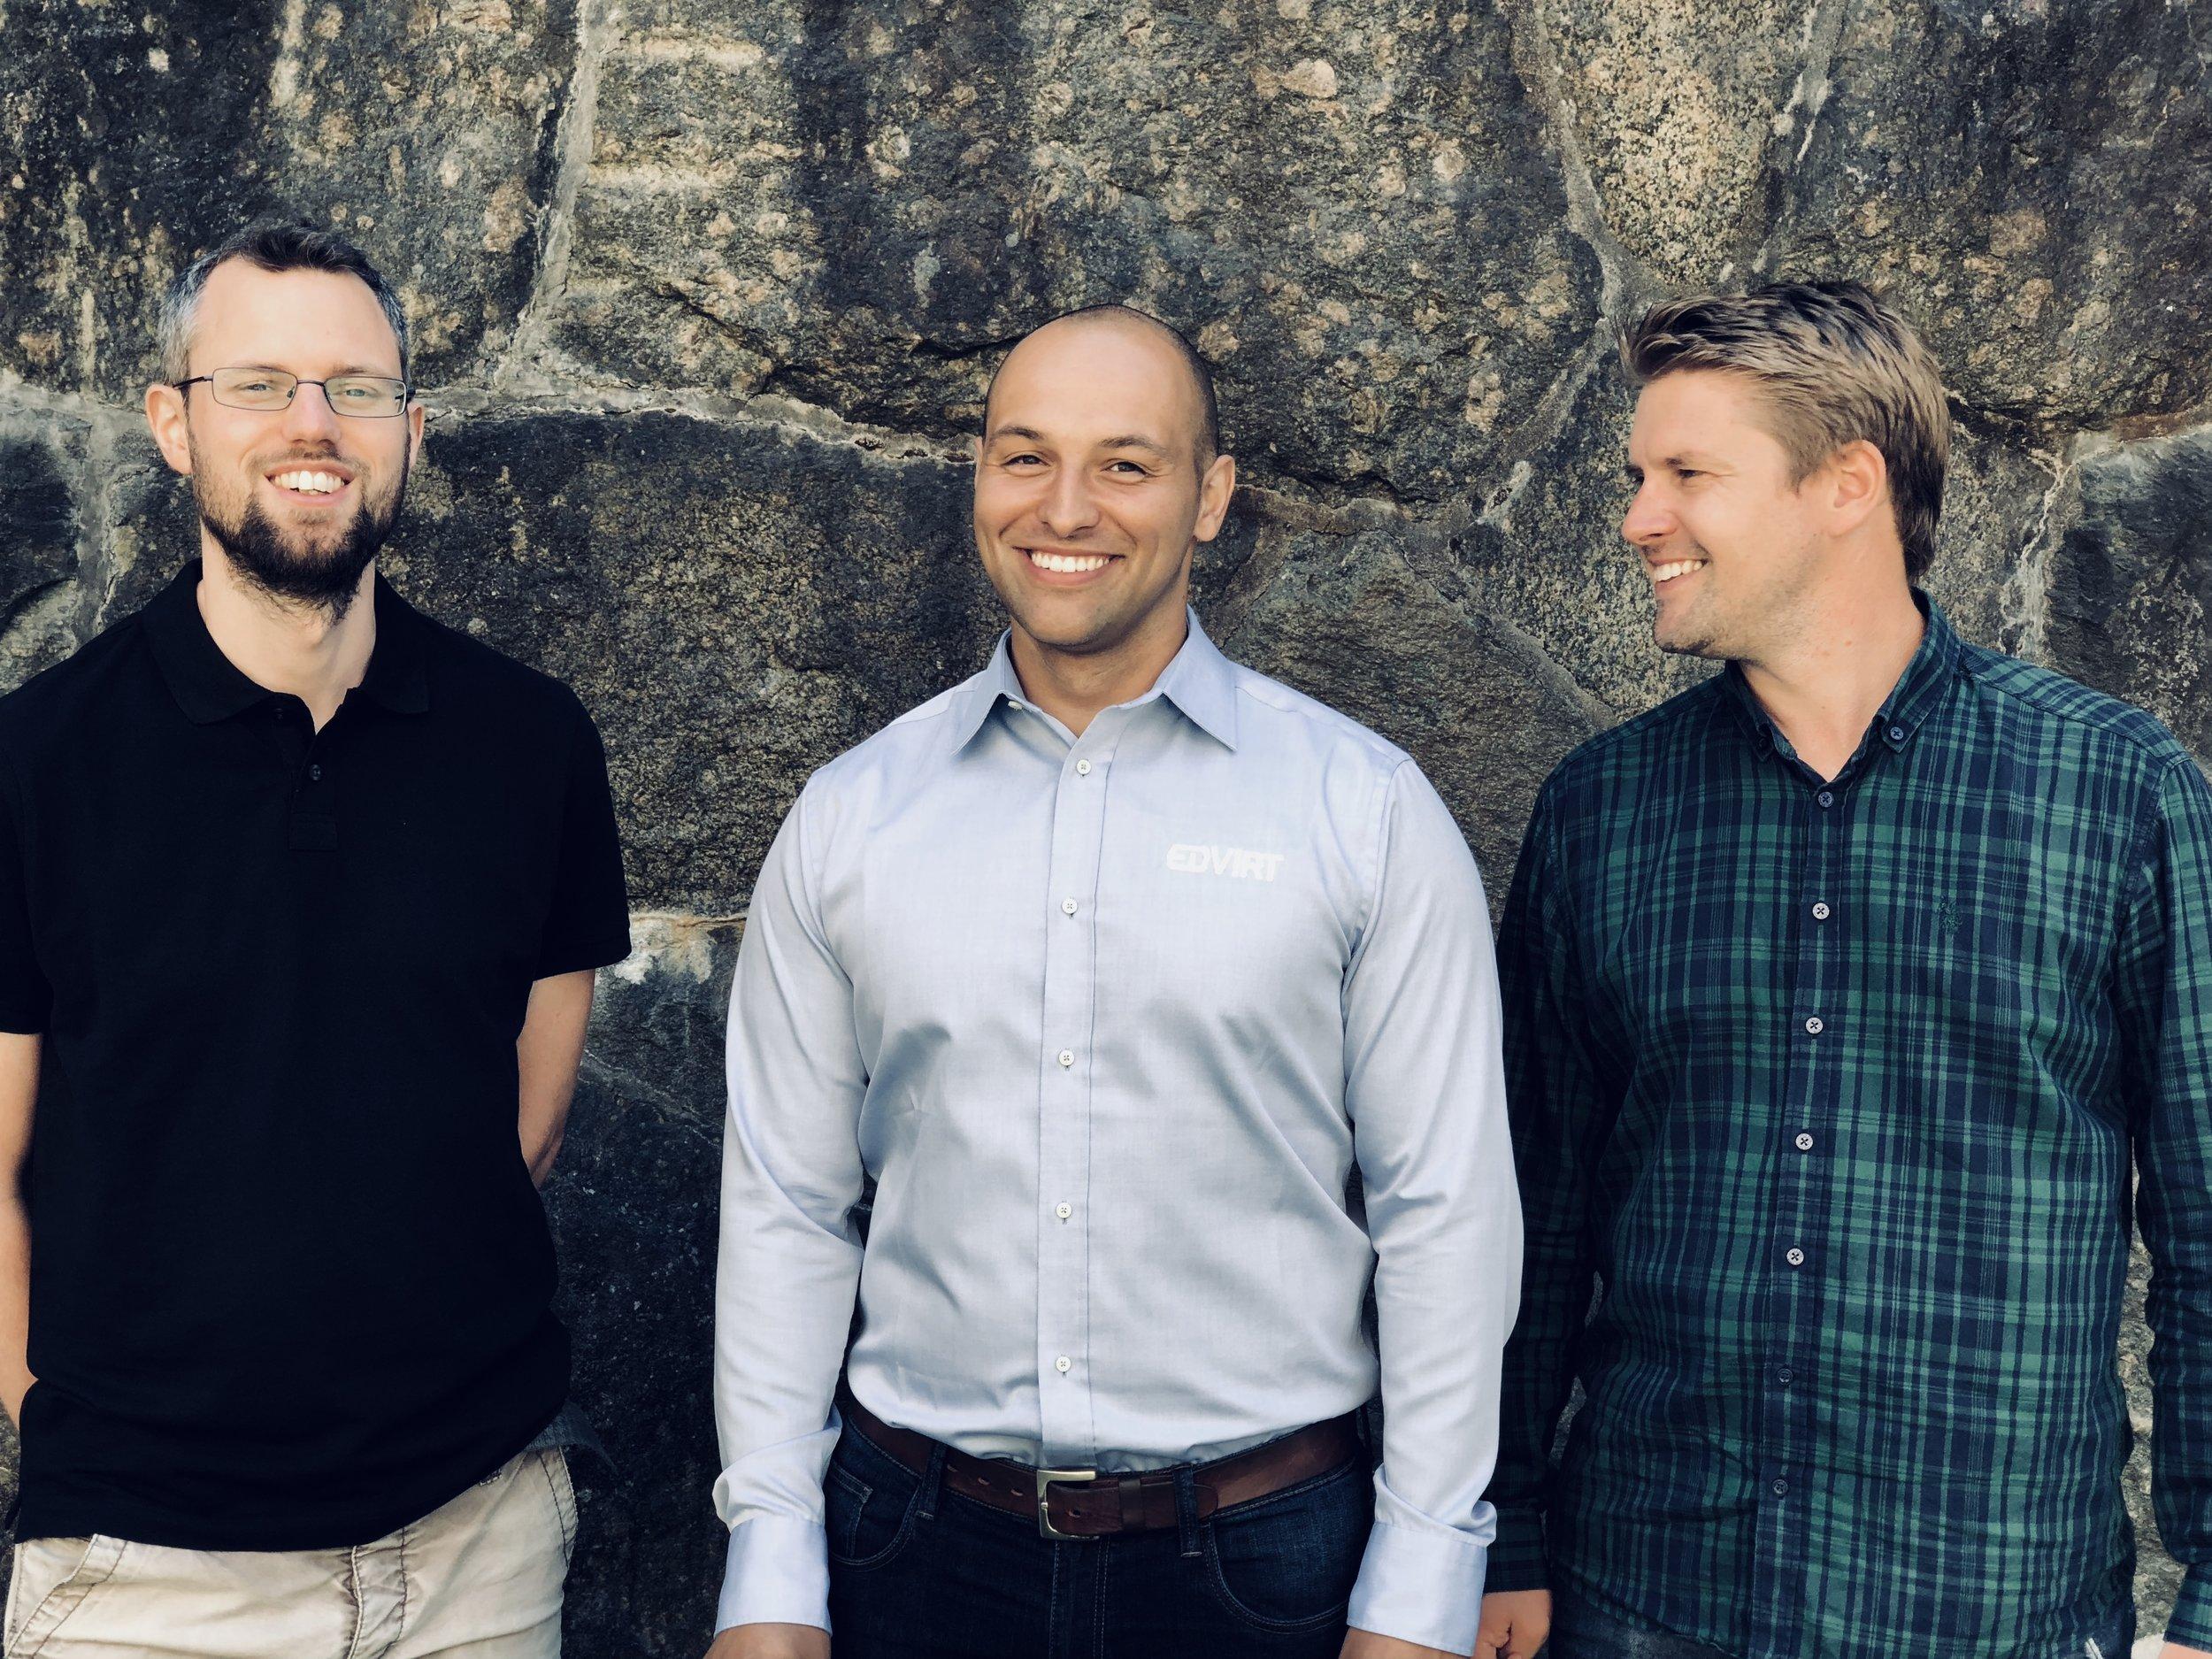 From left: Petter Börjesson - Technical Manager, Tomislav Rogan - CEO,Eric Odkrans - Head of Business Development